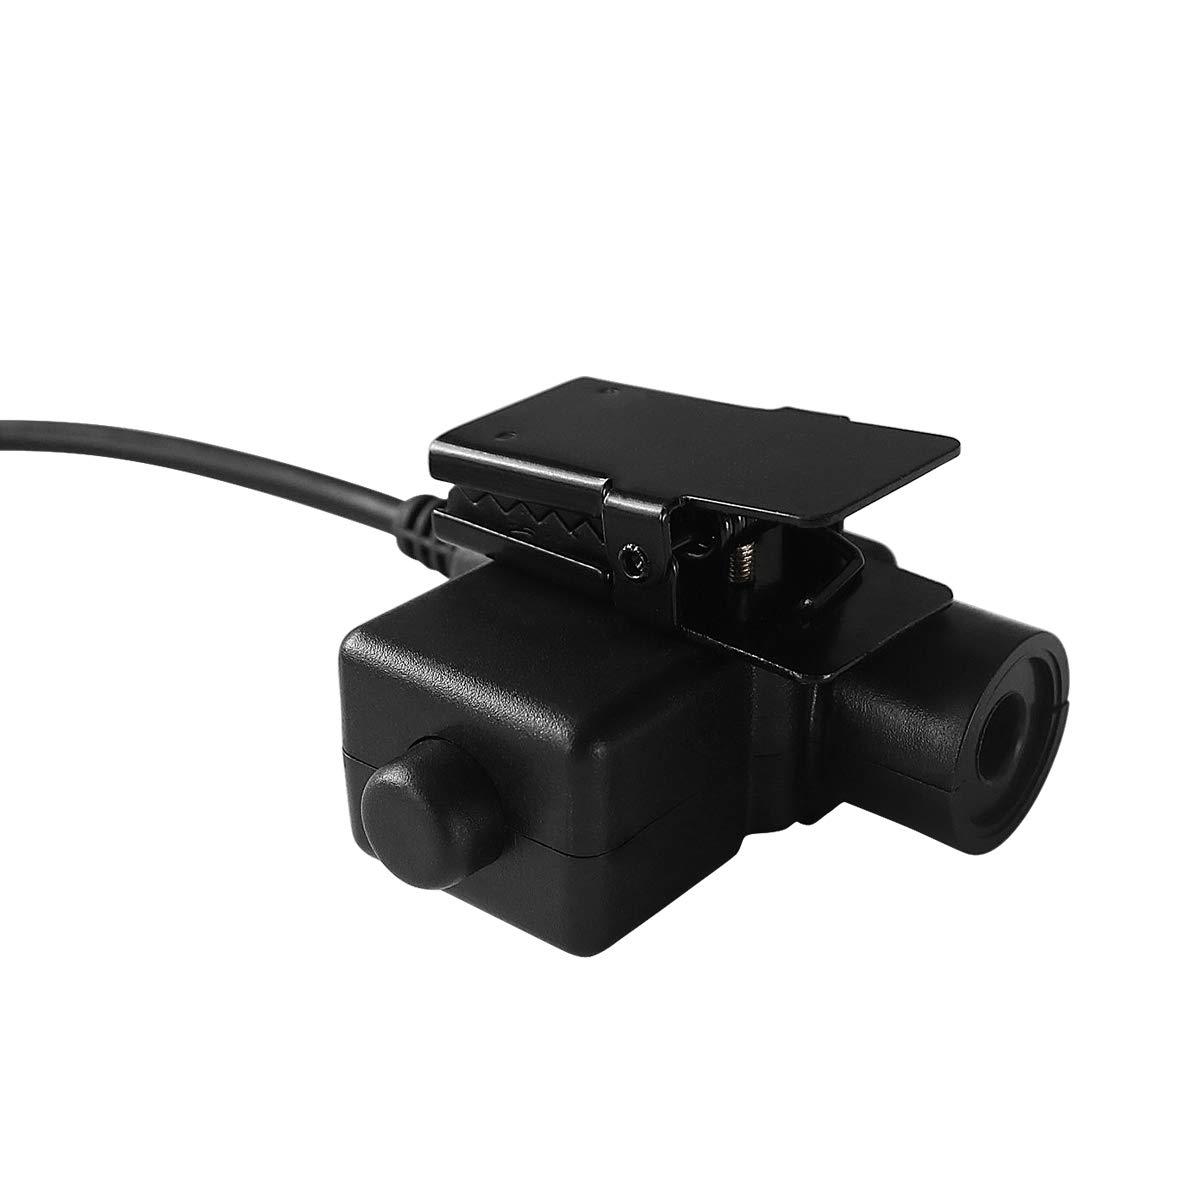 TAC-SKY U94 PTT Headset System Adapter for Motorola 2-Way Radio 2 Pin